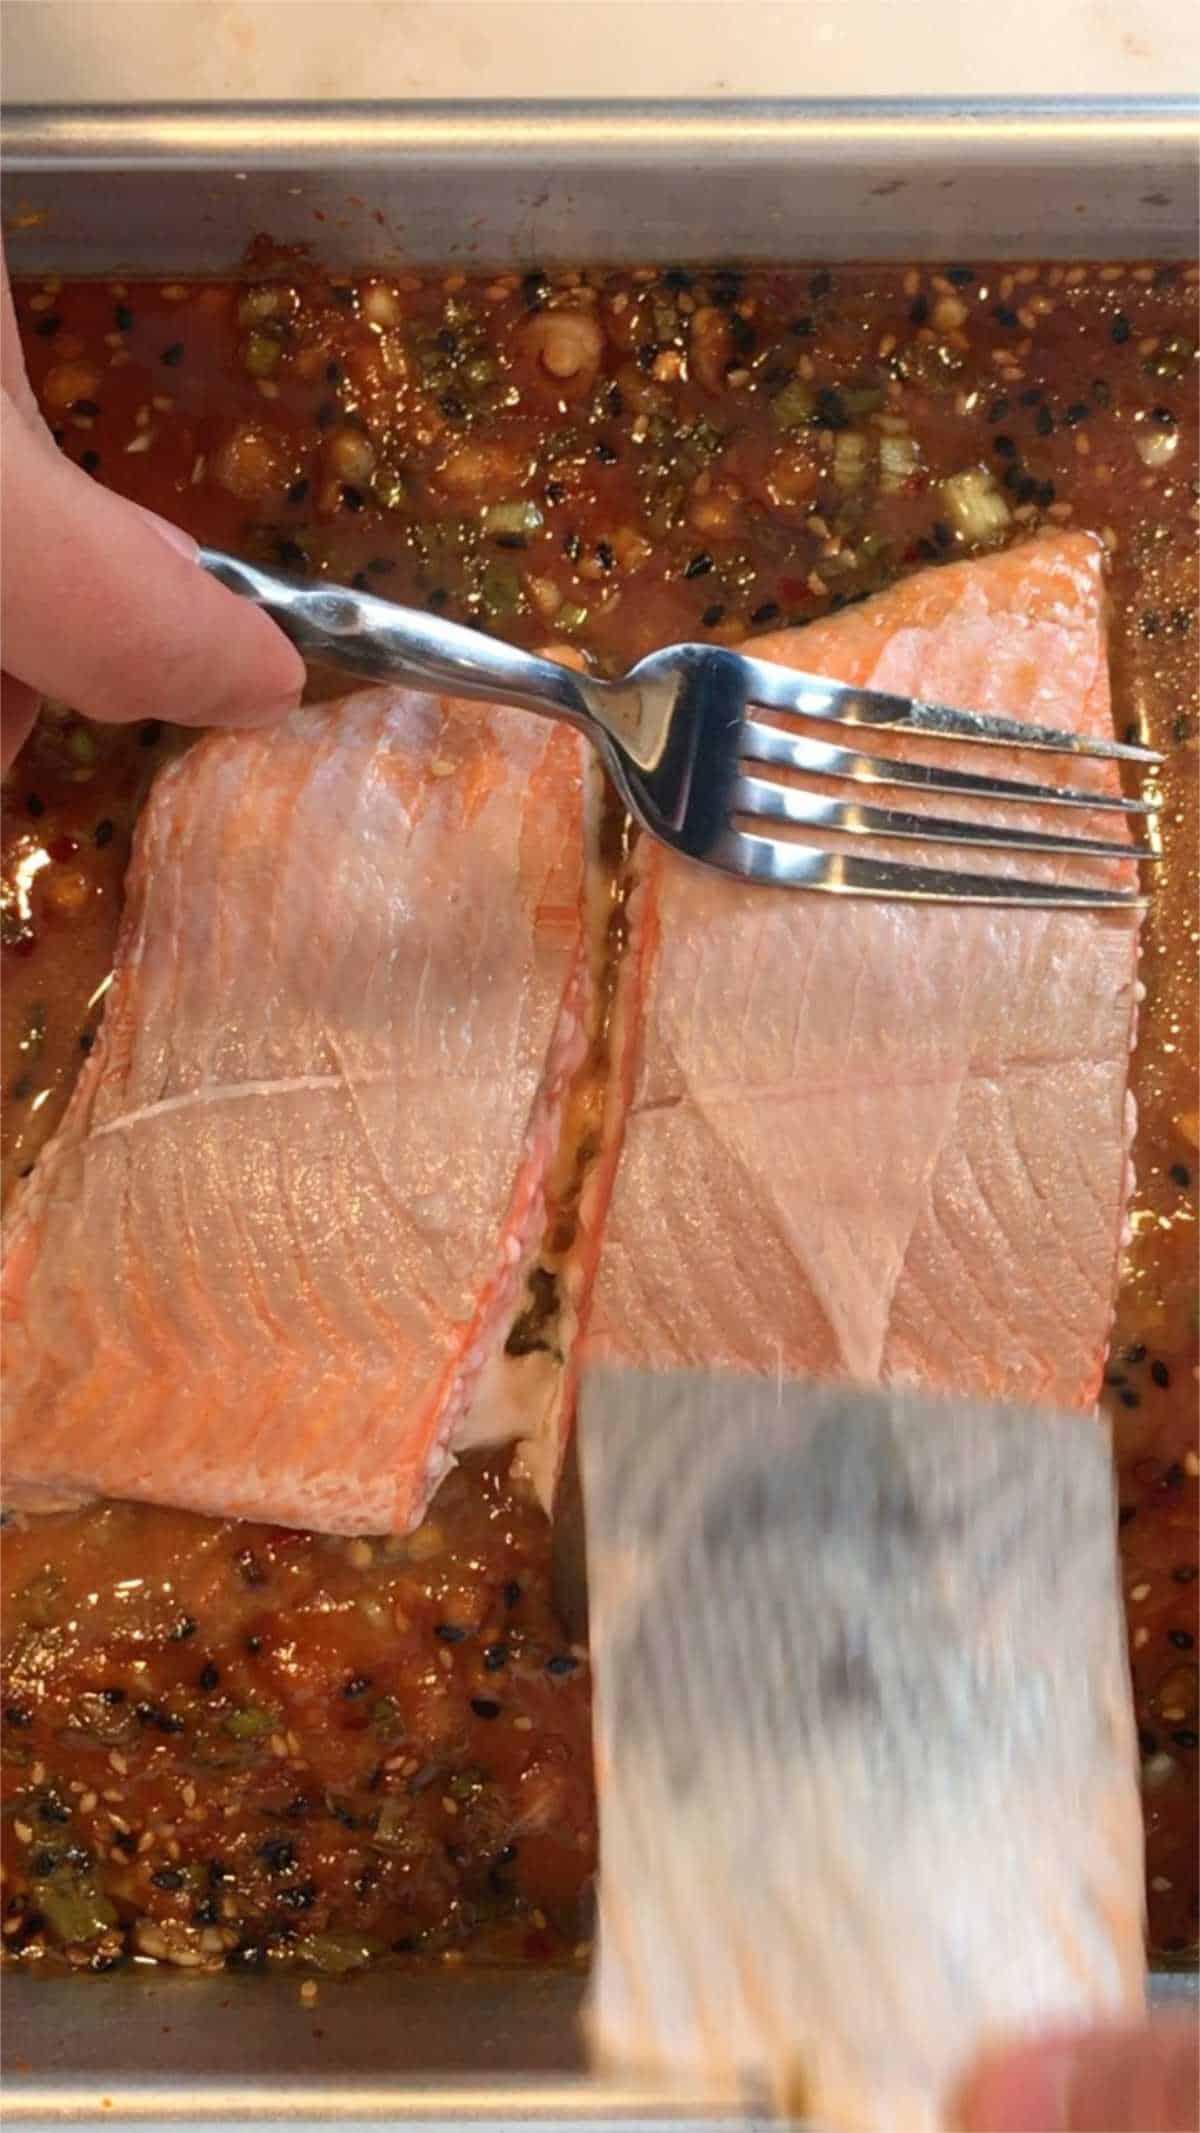 Peeling skin off salmon.